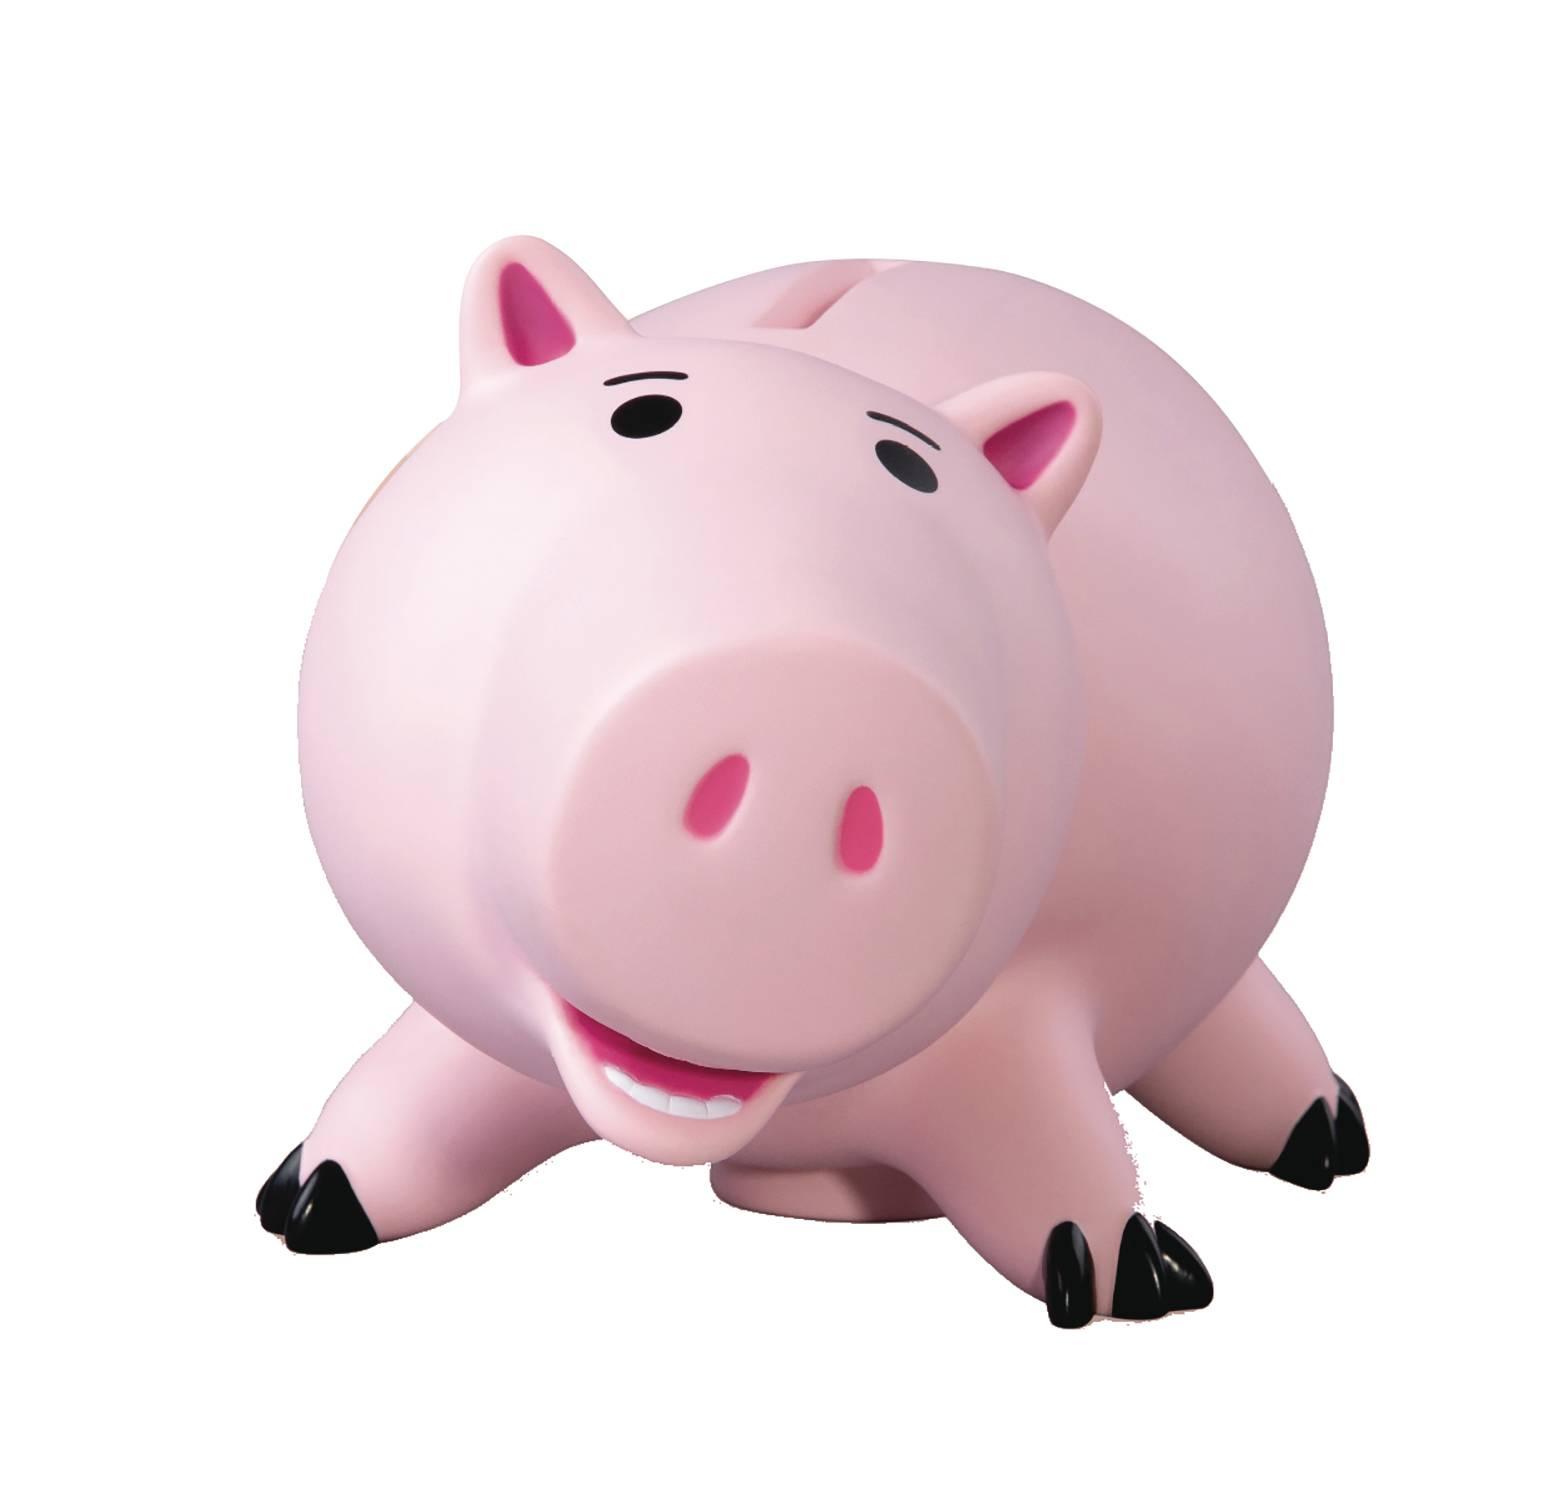 May198661 Toy Story Hamm Px Large Vinyl Piggy Bank